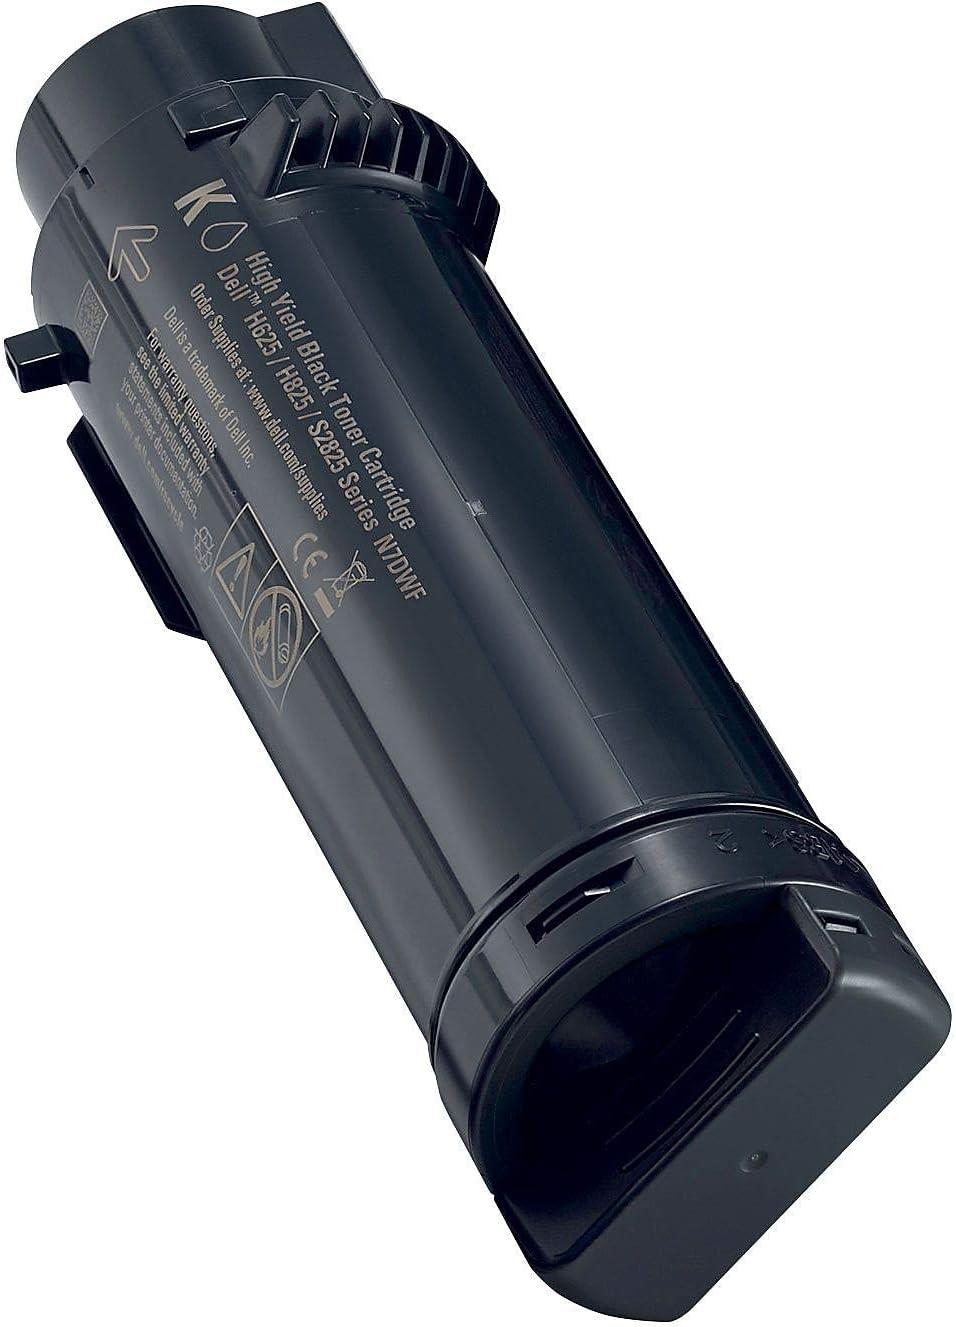 Dell 2104295 F9G3N Black Toner Cartridge Standard KNRMF